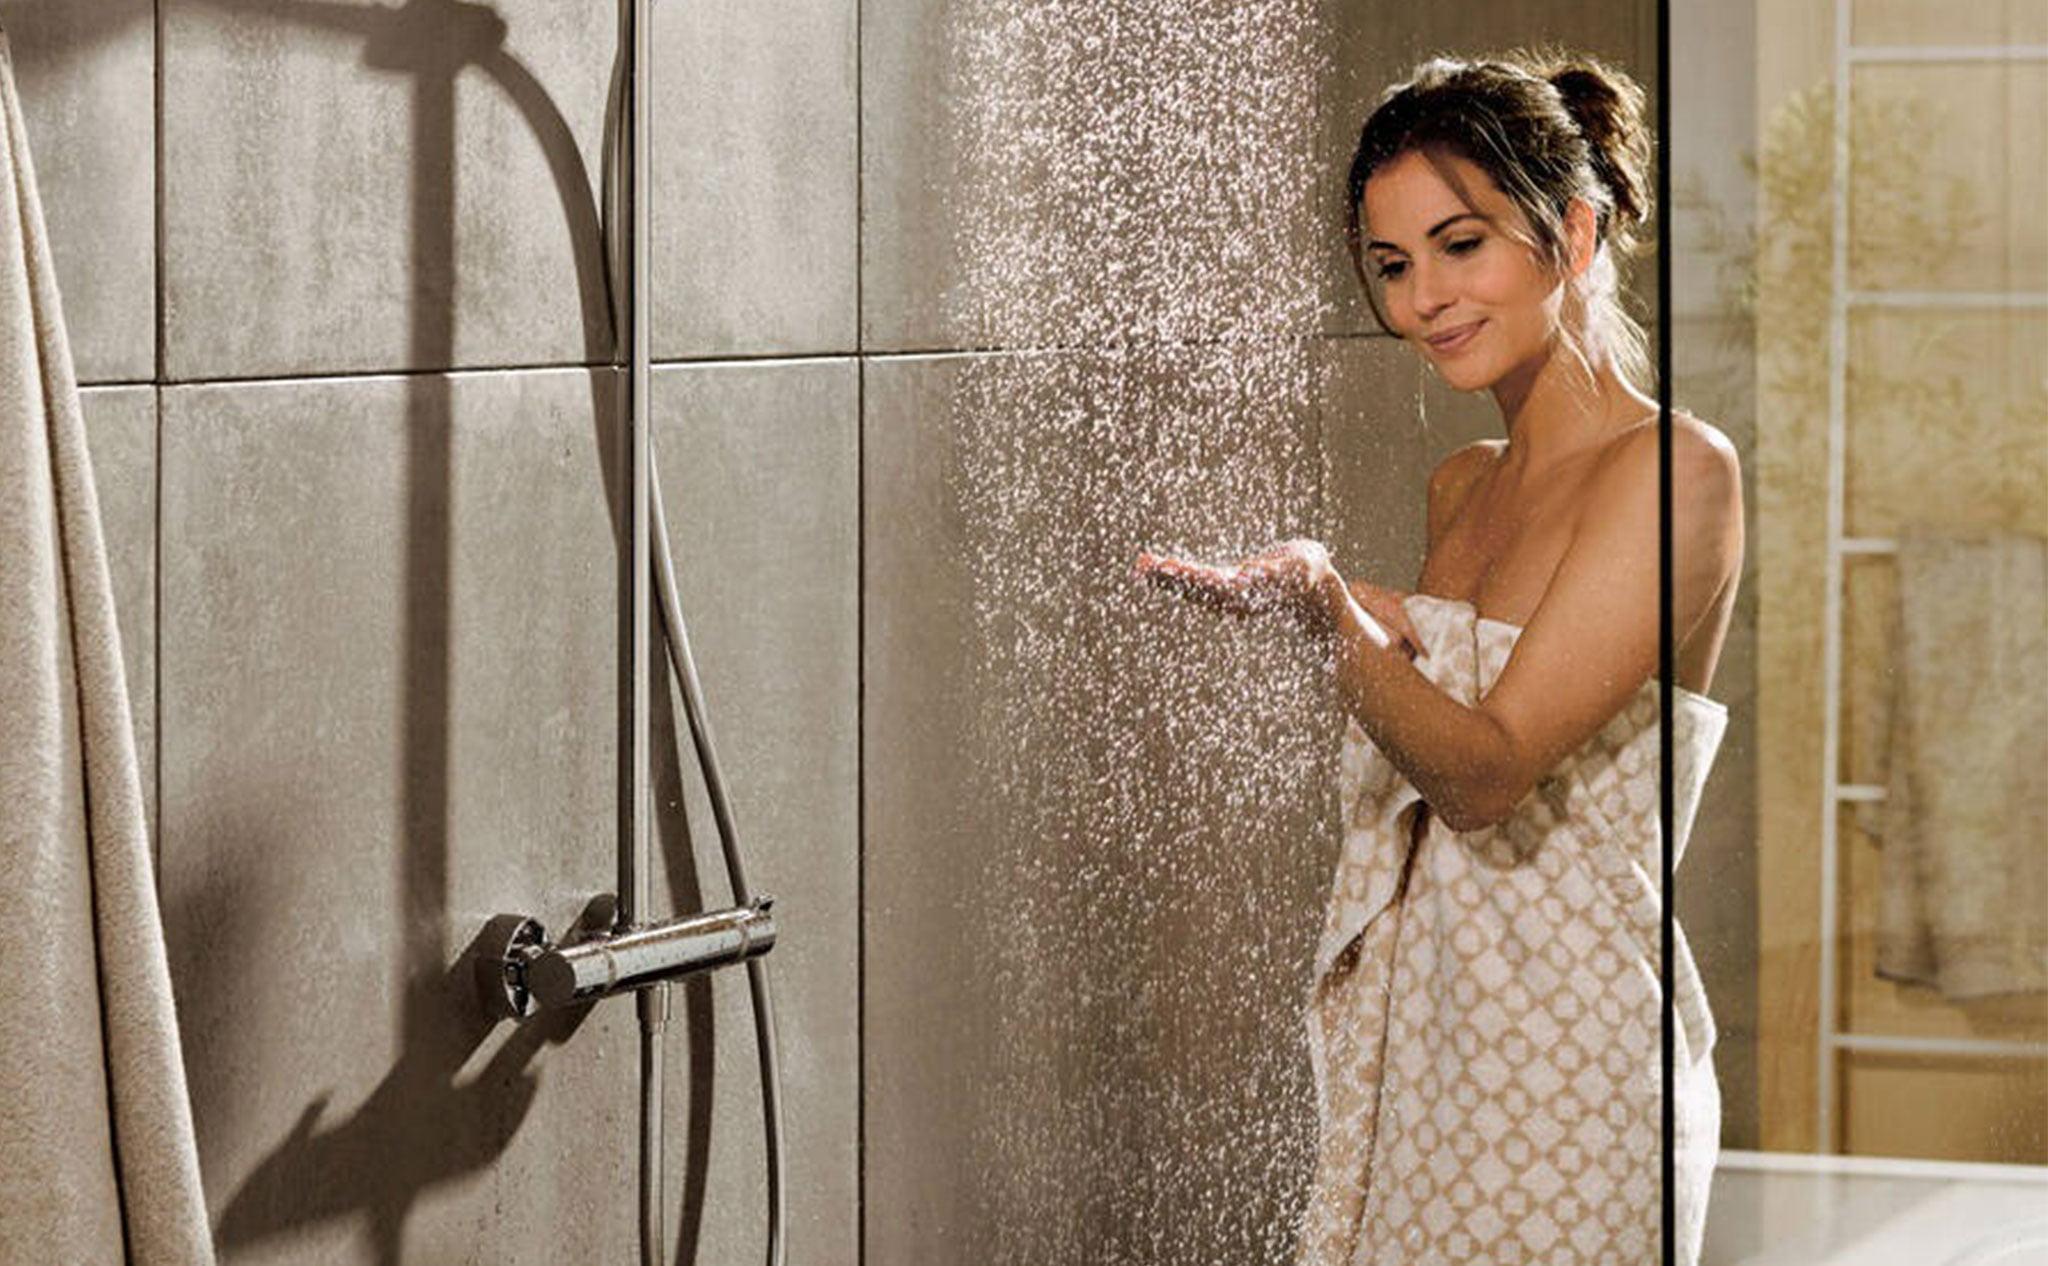 Grifos termostáticos de ducha en Dénia (foto destacada) – Suministros Denia